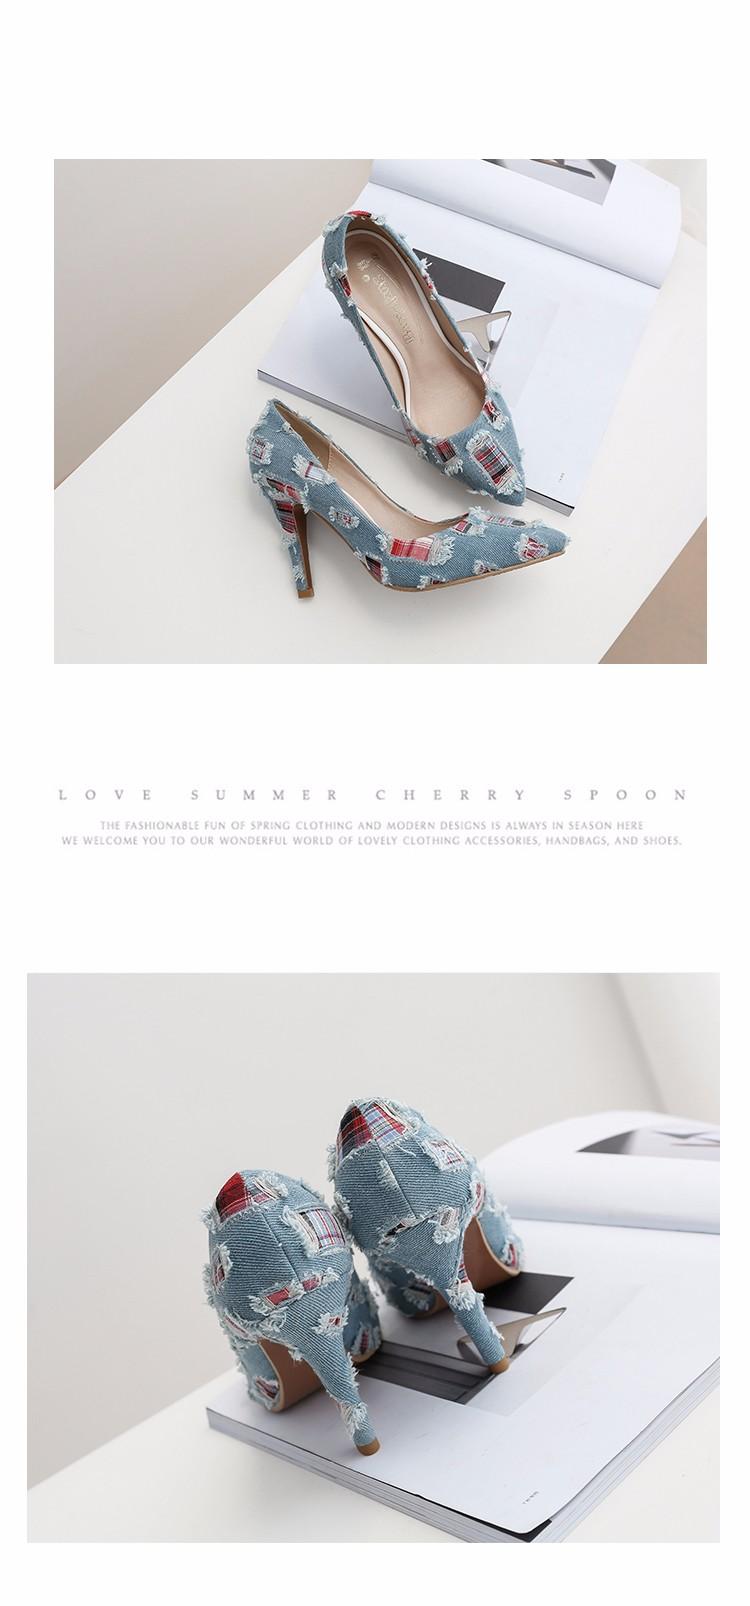 New arrival Denim Ladies Shoes pointed toe high heels Free Shipping! HTB1tV3YSpXXXXc0XVXXq6xXFXXX3